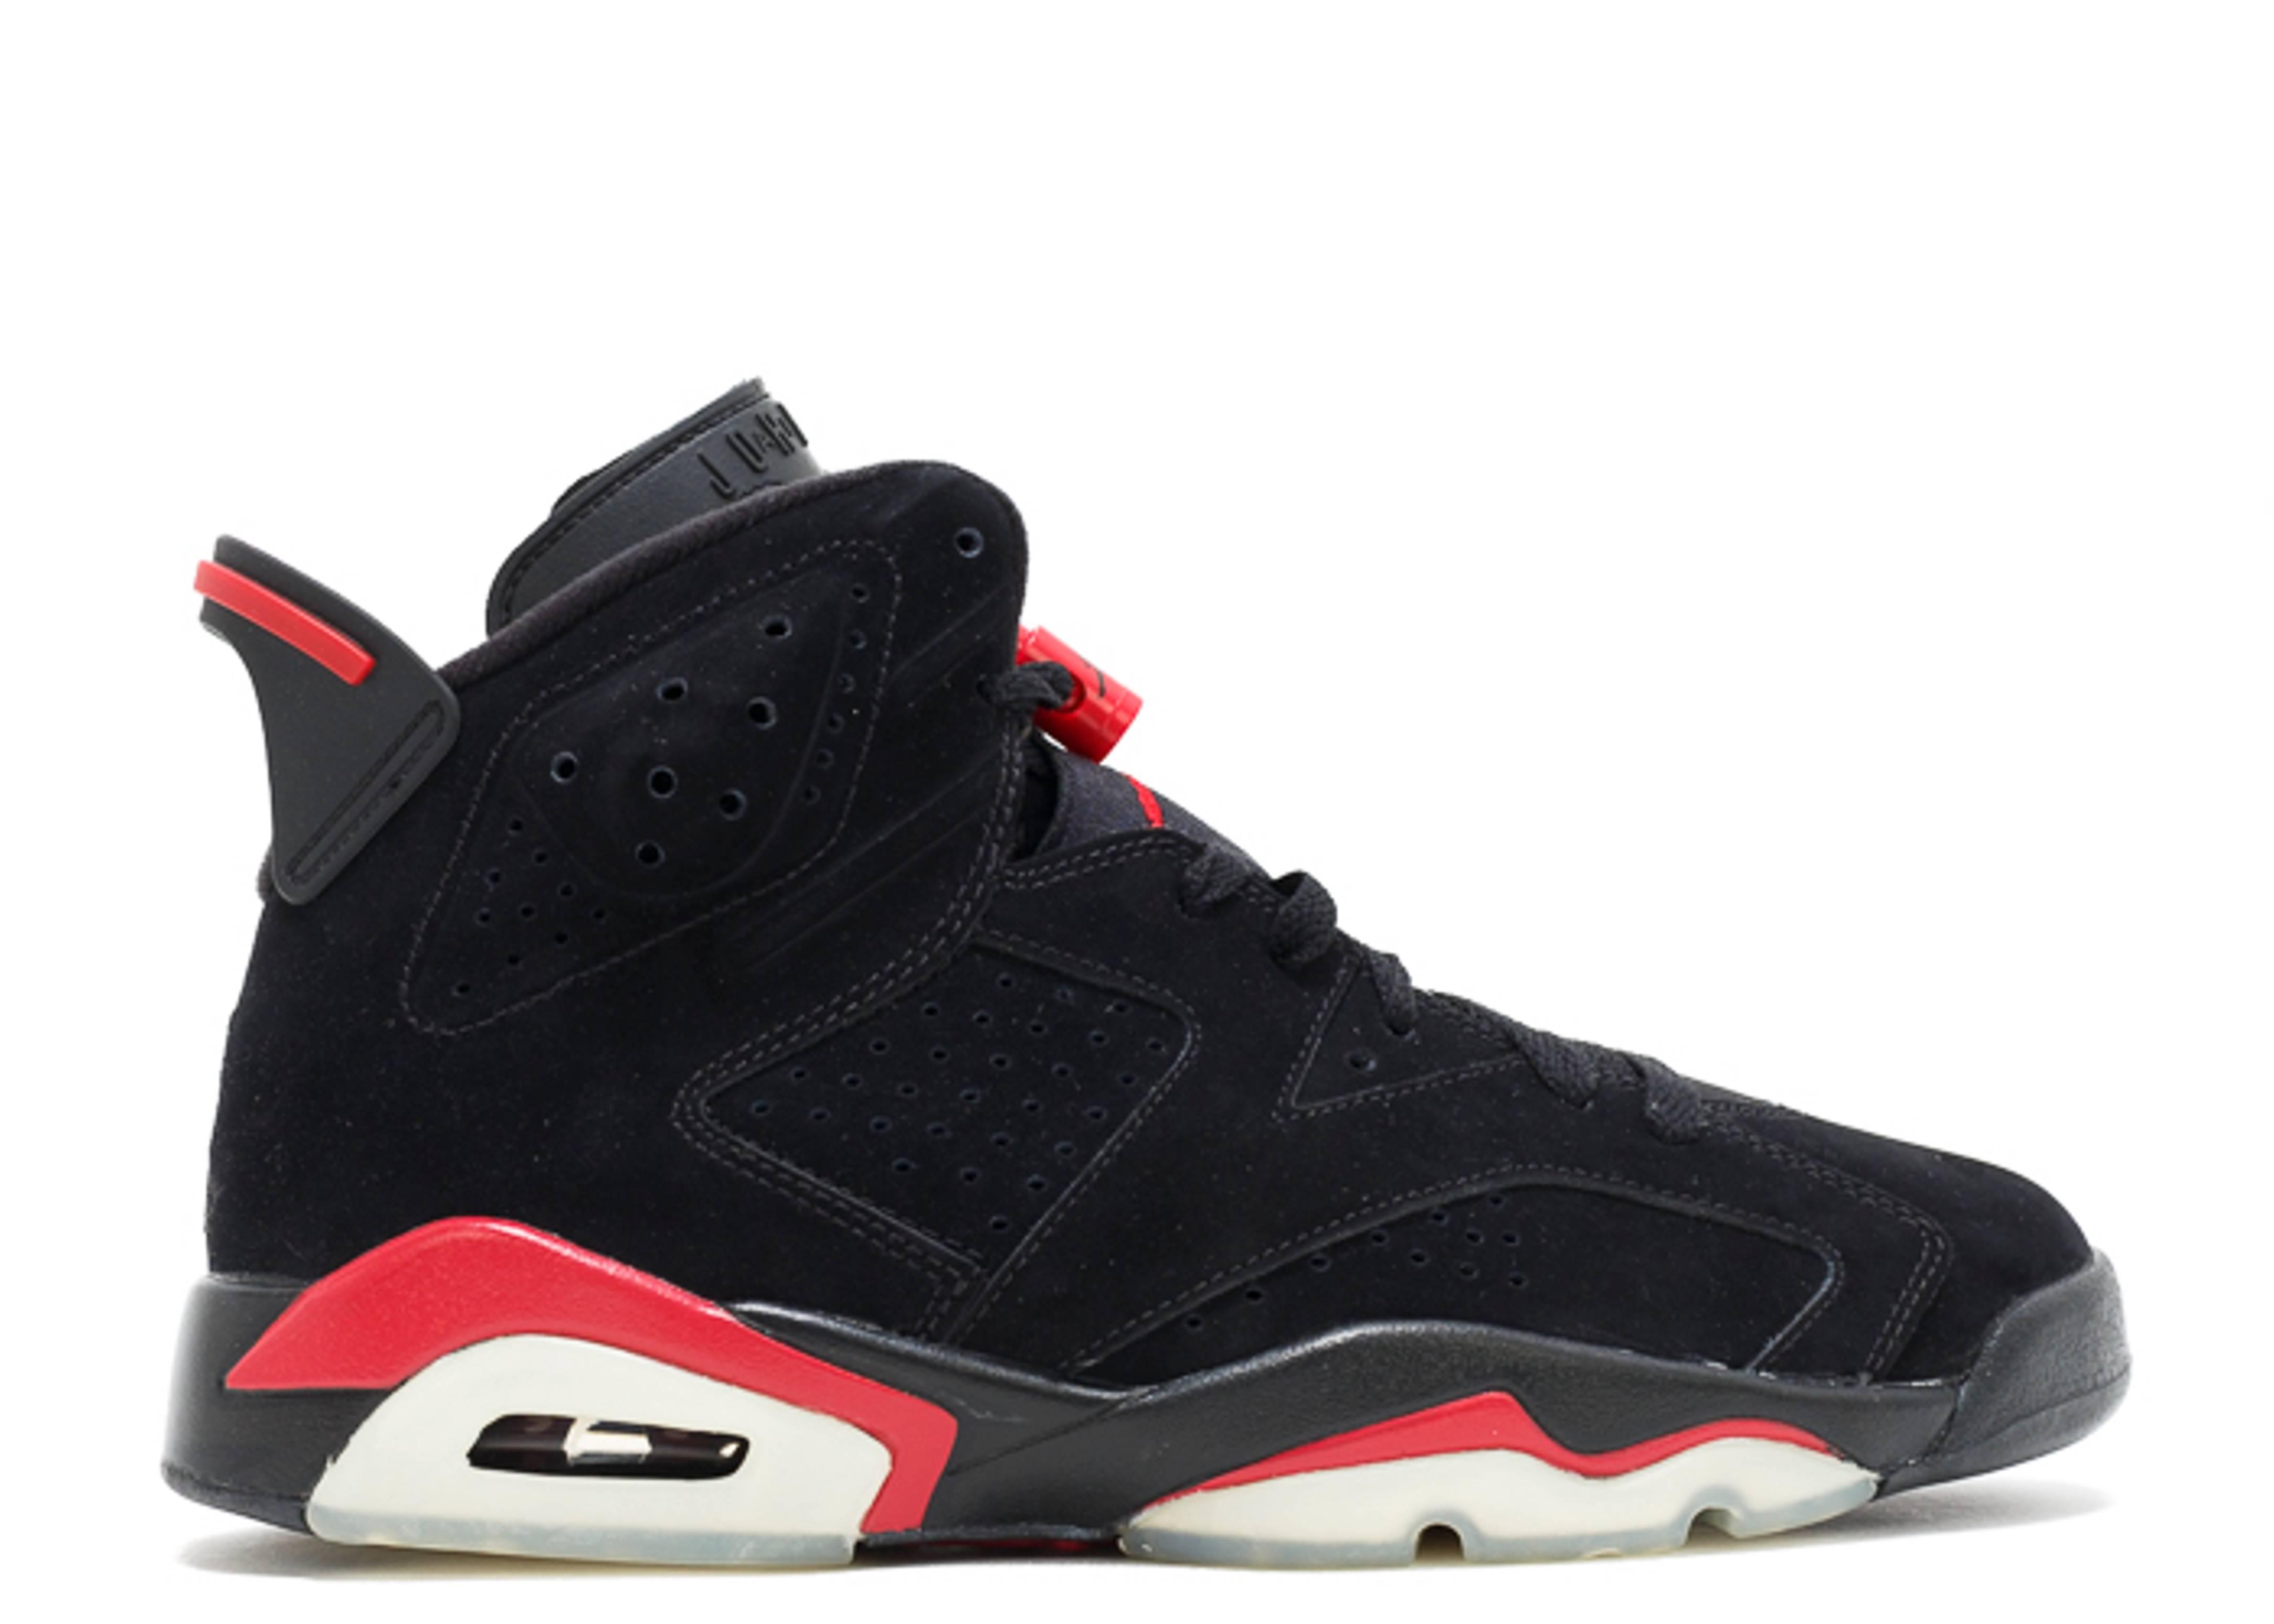 sale retailer e551c 7ec36 Air Jordan 6 Retro - Air Jordan - 384664 061 - black varsity red   Flight  Club